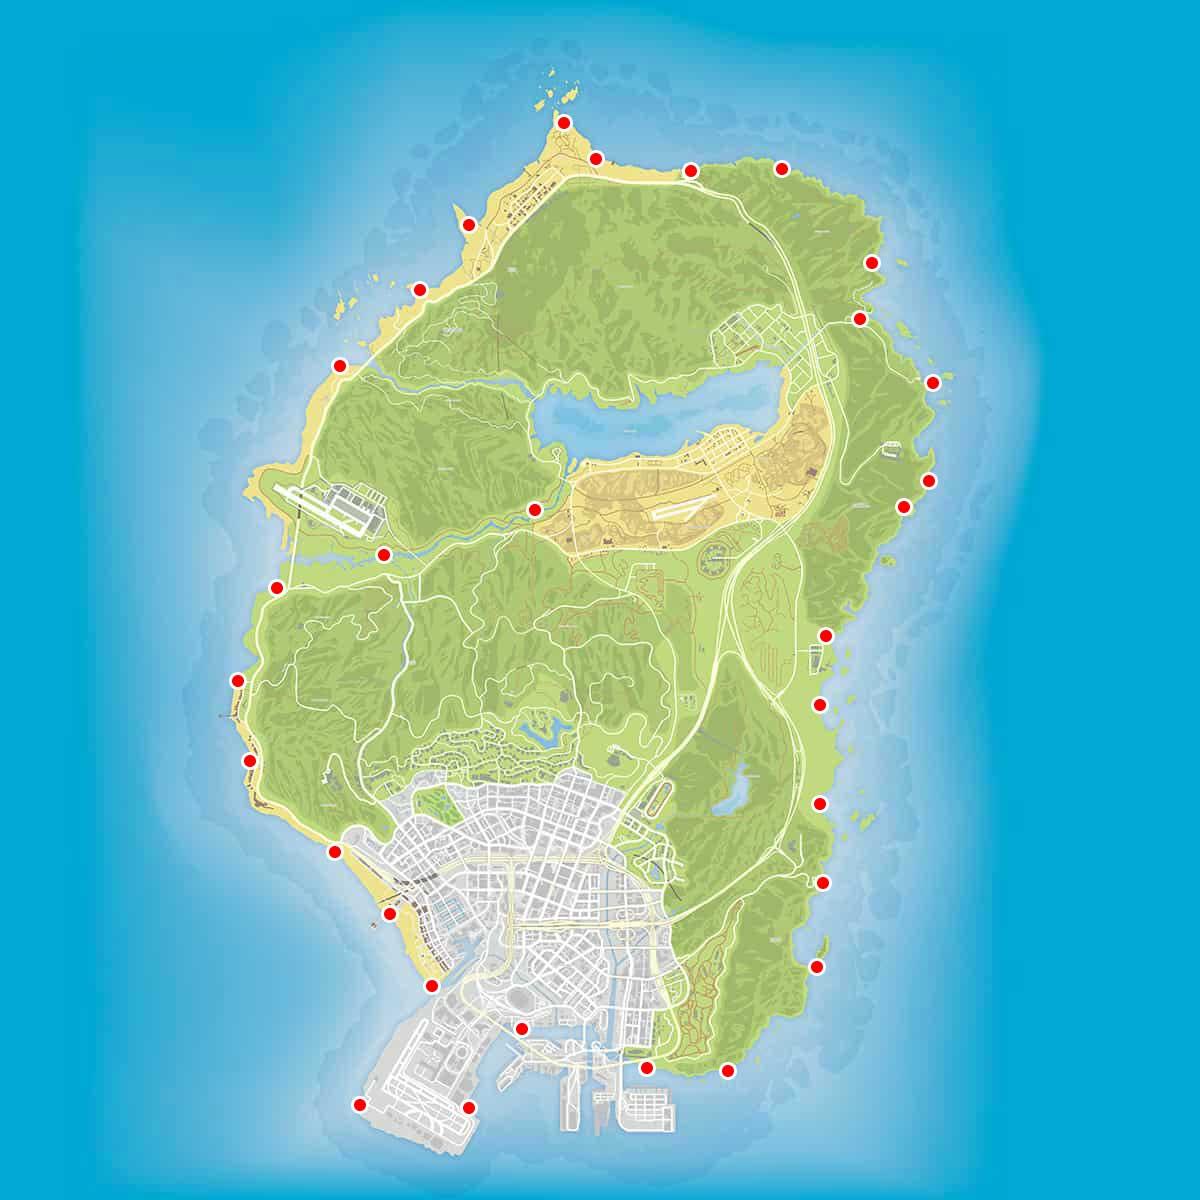 carte-gta-5-online-emplacements-epaves-tresor